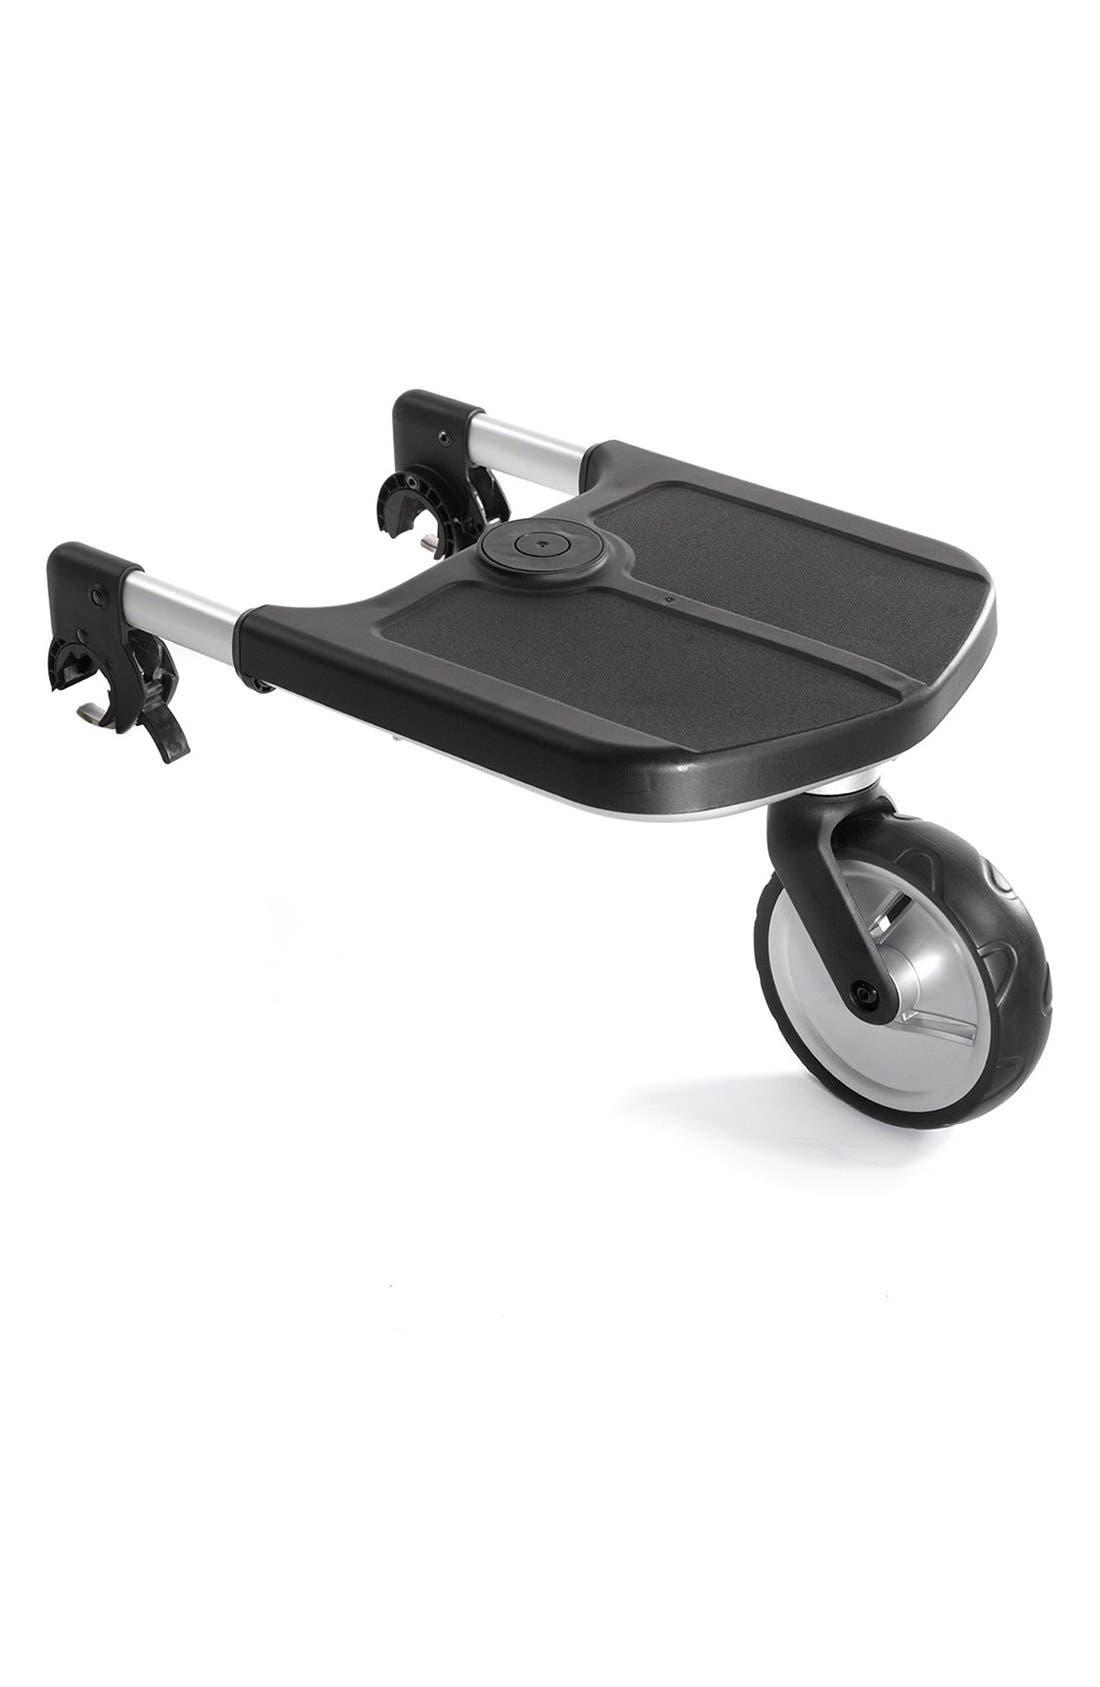 Mutsy 'Igo/Evo - Step-Up Board' Stroller Rider